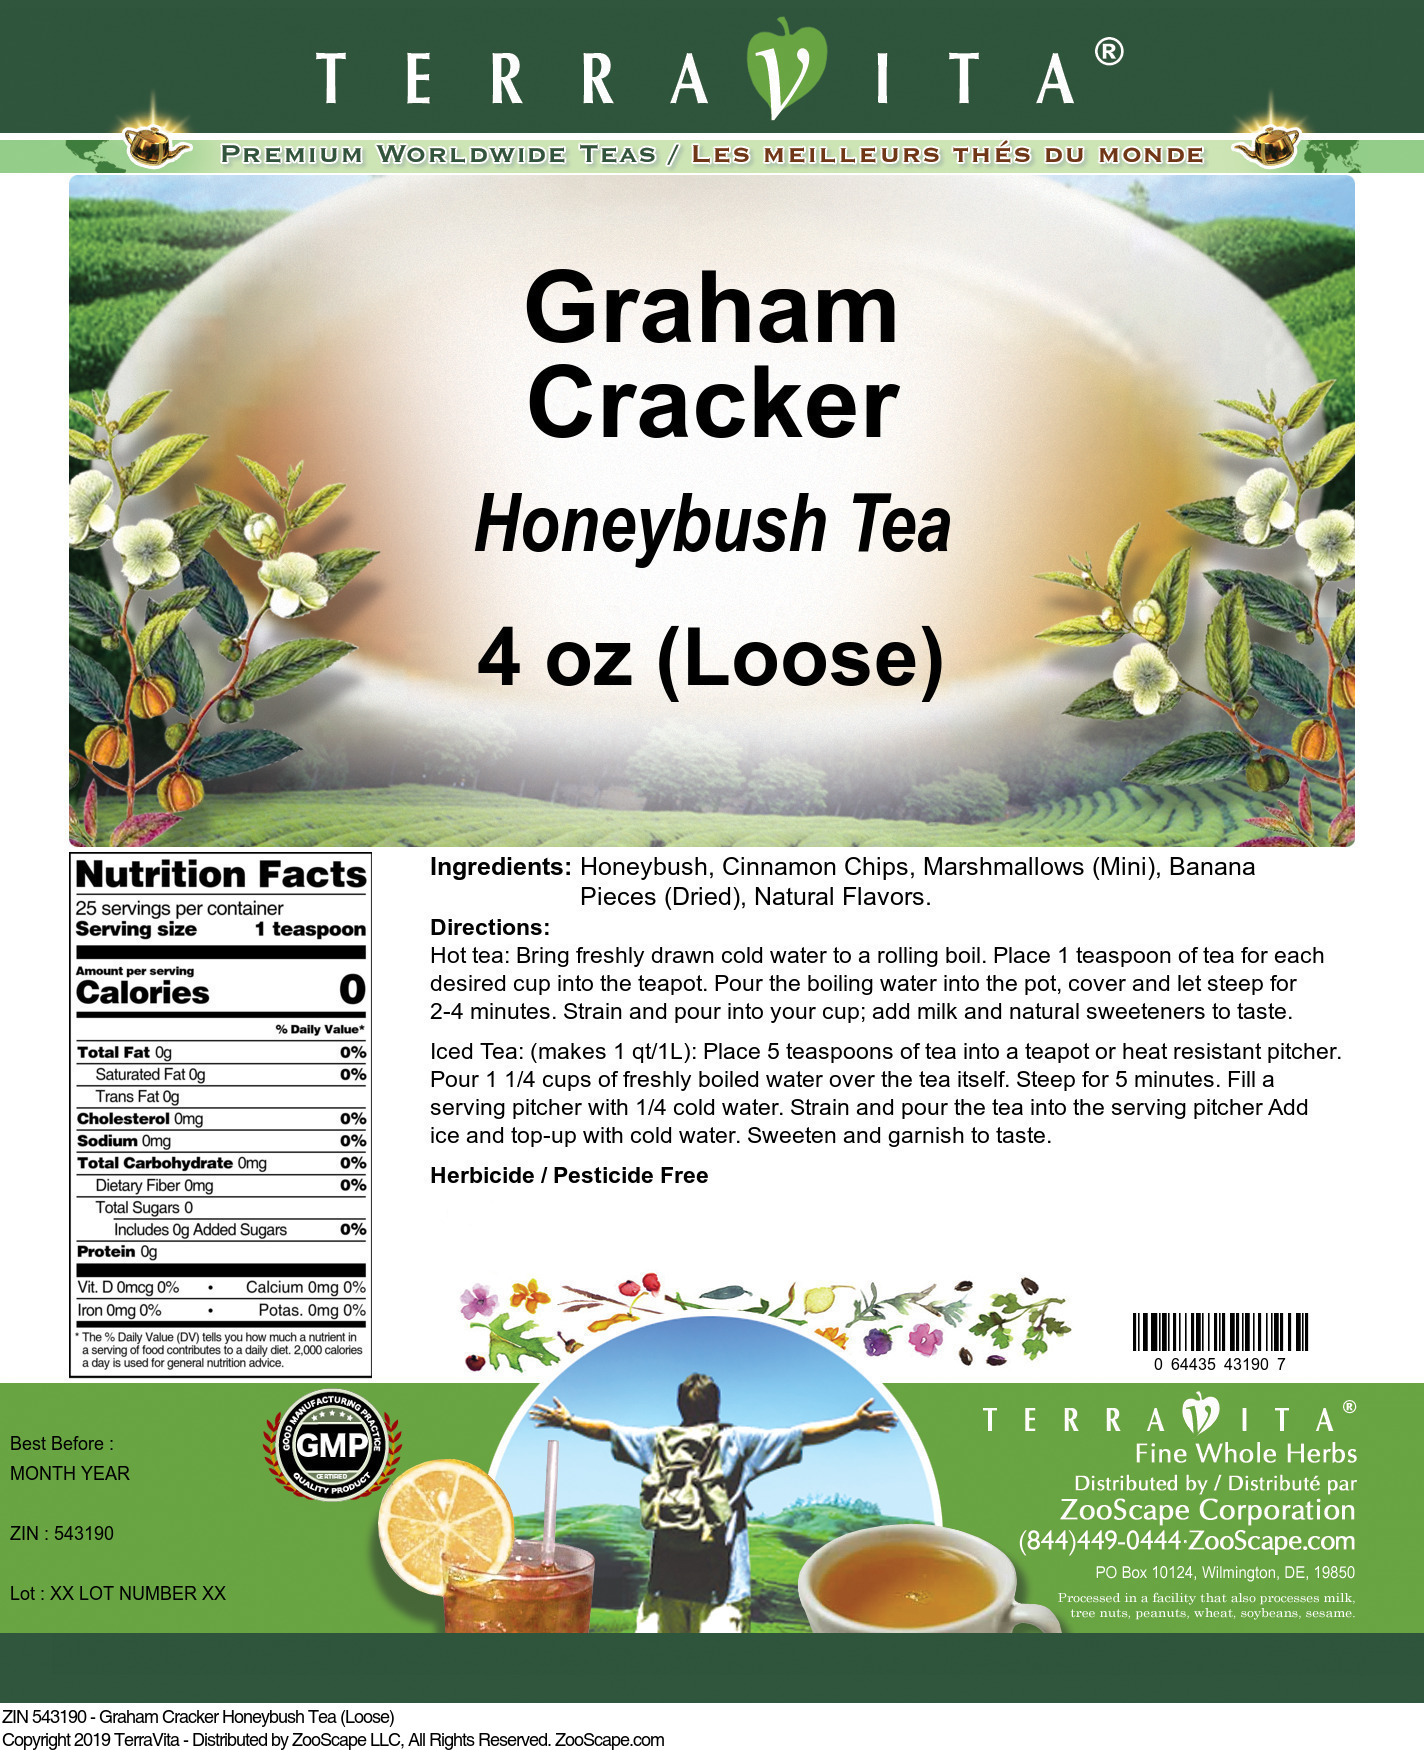 Graham Cracker Honeybush Tea (Loose)